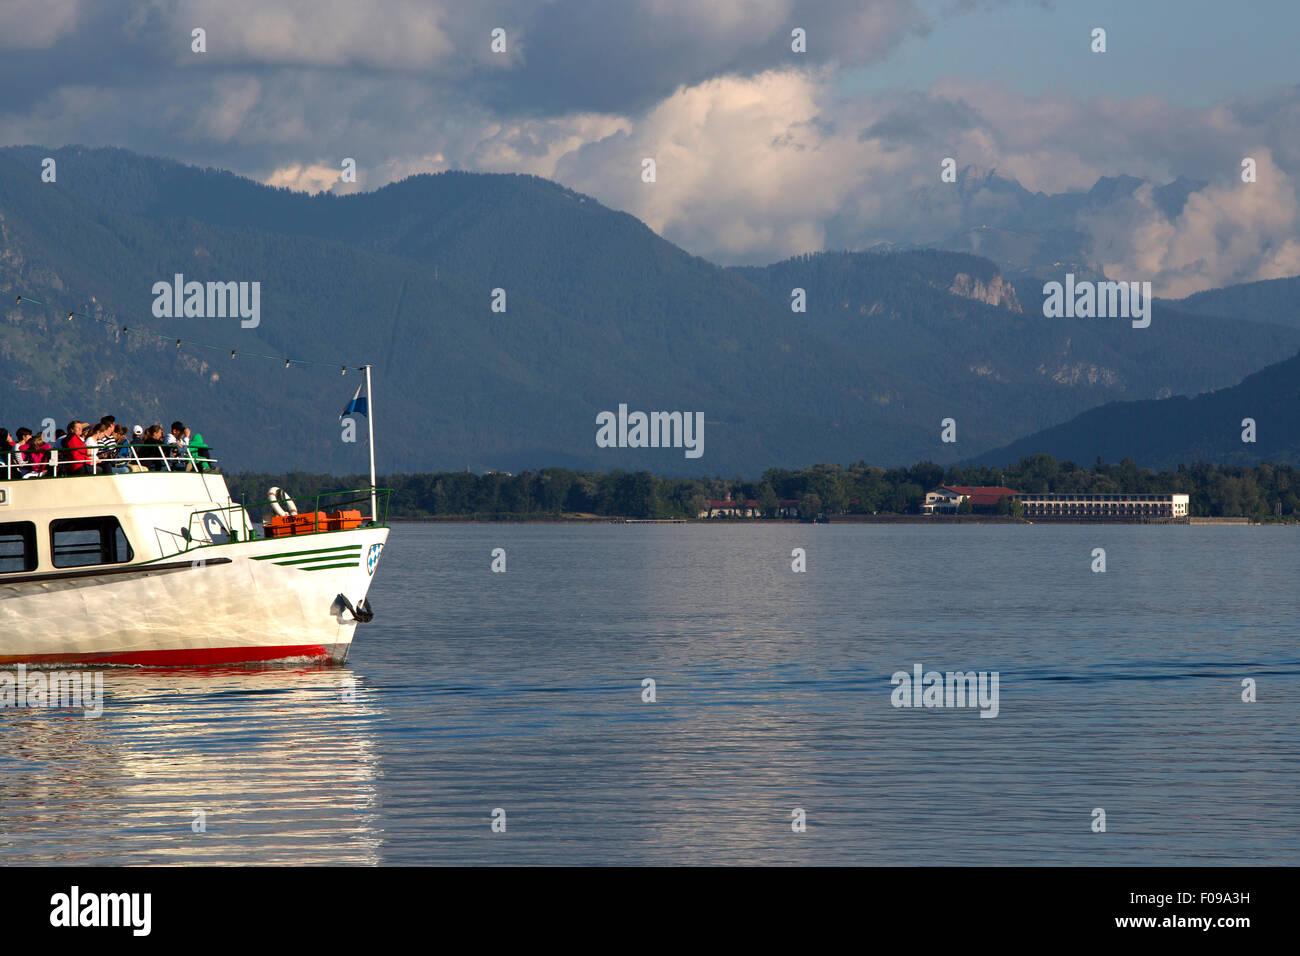 Steamship at lake Chiemsee in Bavaria, South Germany - Stock Image